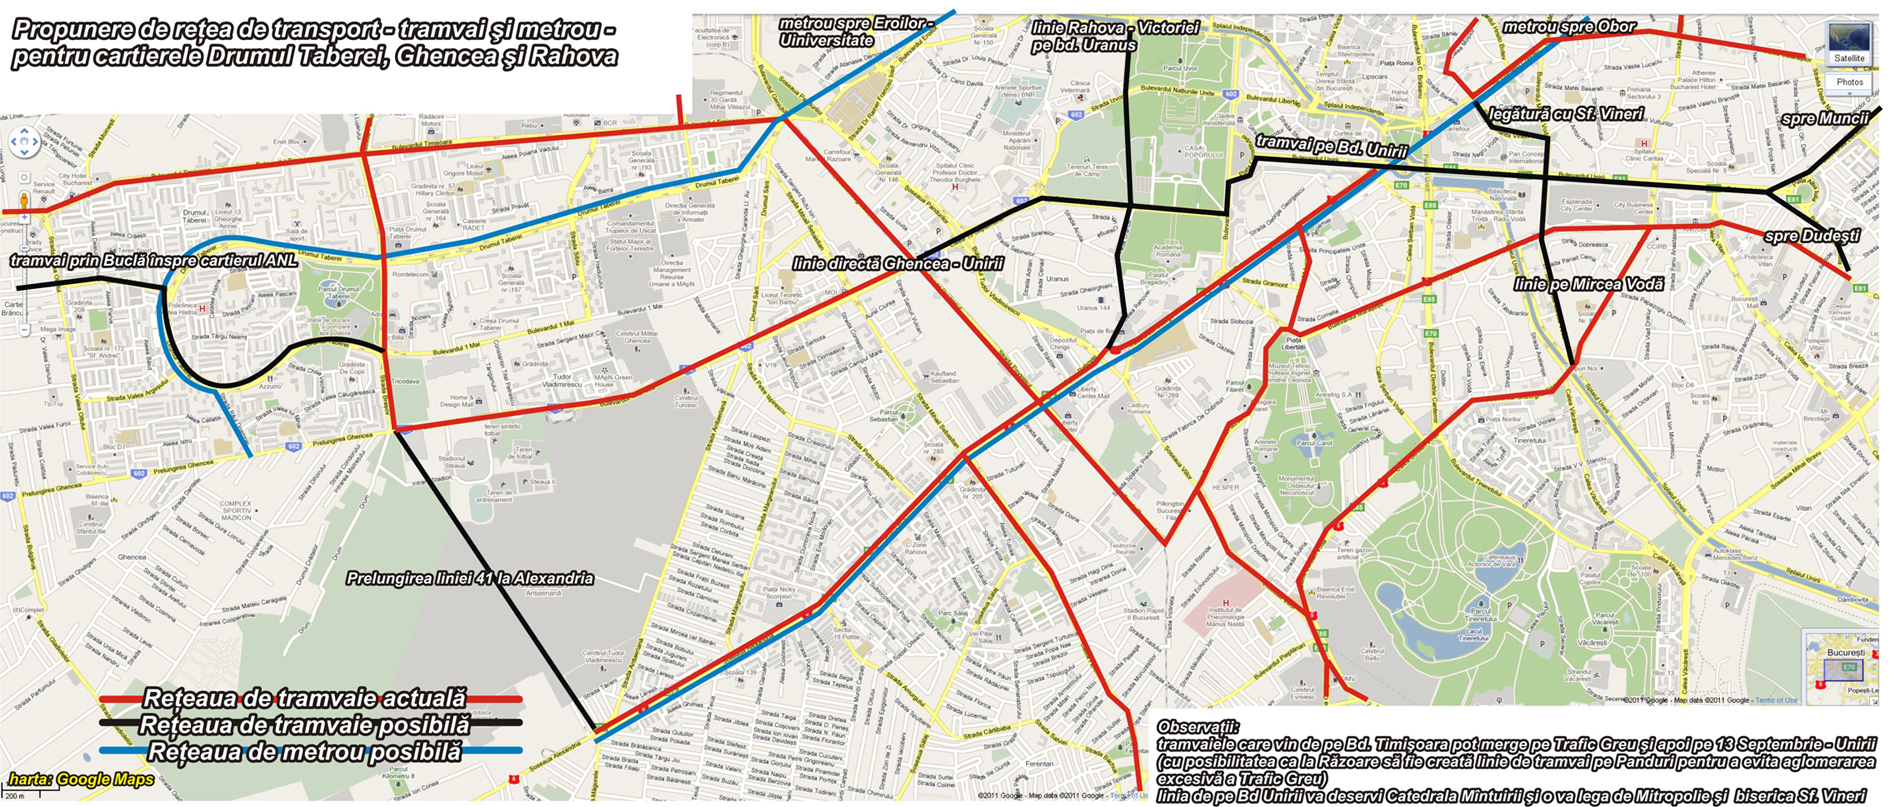 Metrou suspendat in Drumul Taberei | Bucurestii Vechi si Noi  |Metrou Drumul Taberei